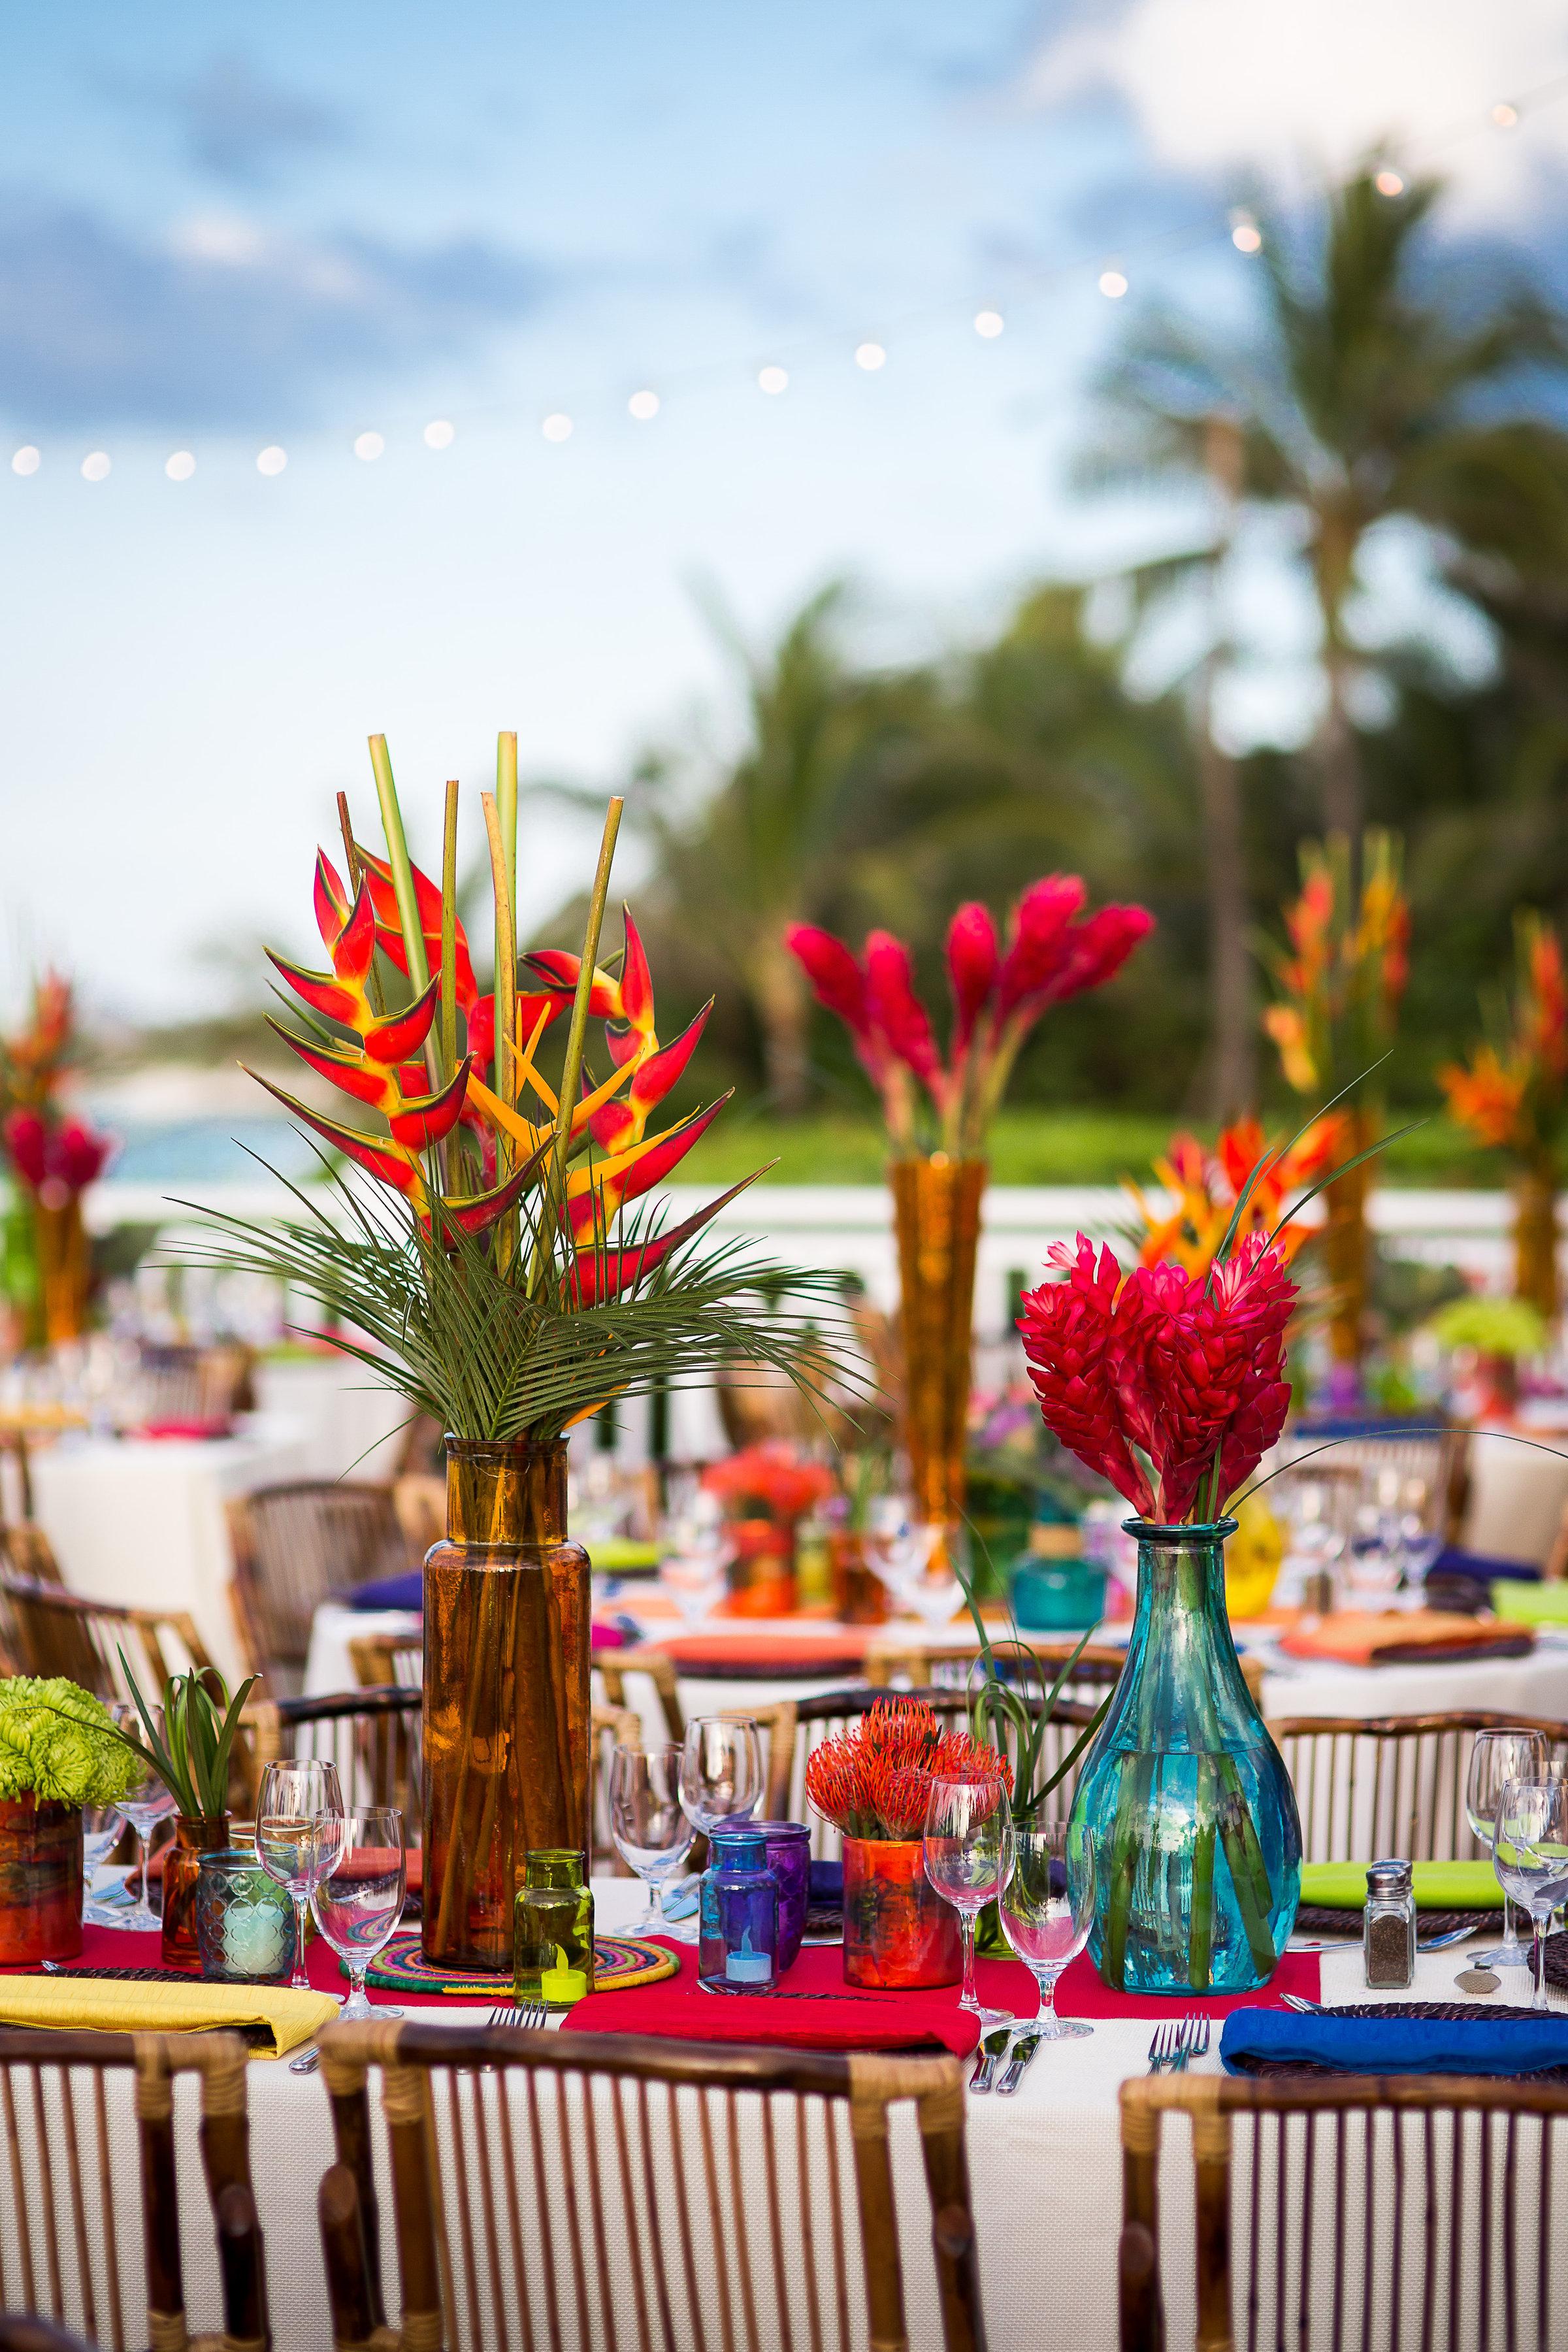 Ceci_New_York_Ceci_Style_Ceci_Johnson_Luxury_Lifestyle_Destination_Bahamas_Wedding_Letterpress_Inspiration_Design_Custom_Couture_Personalized_Invitations_23.jpg